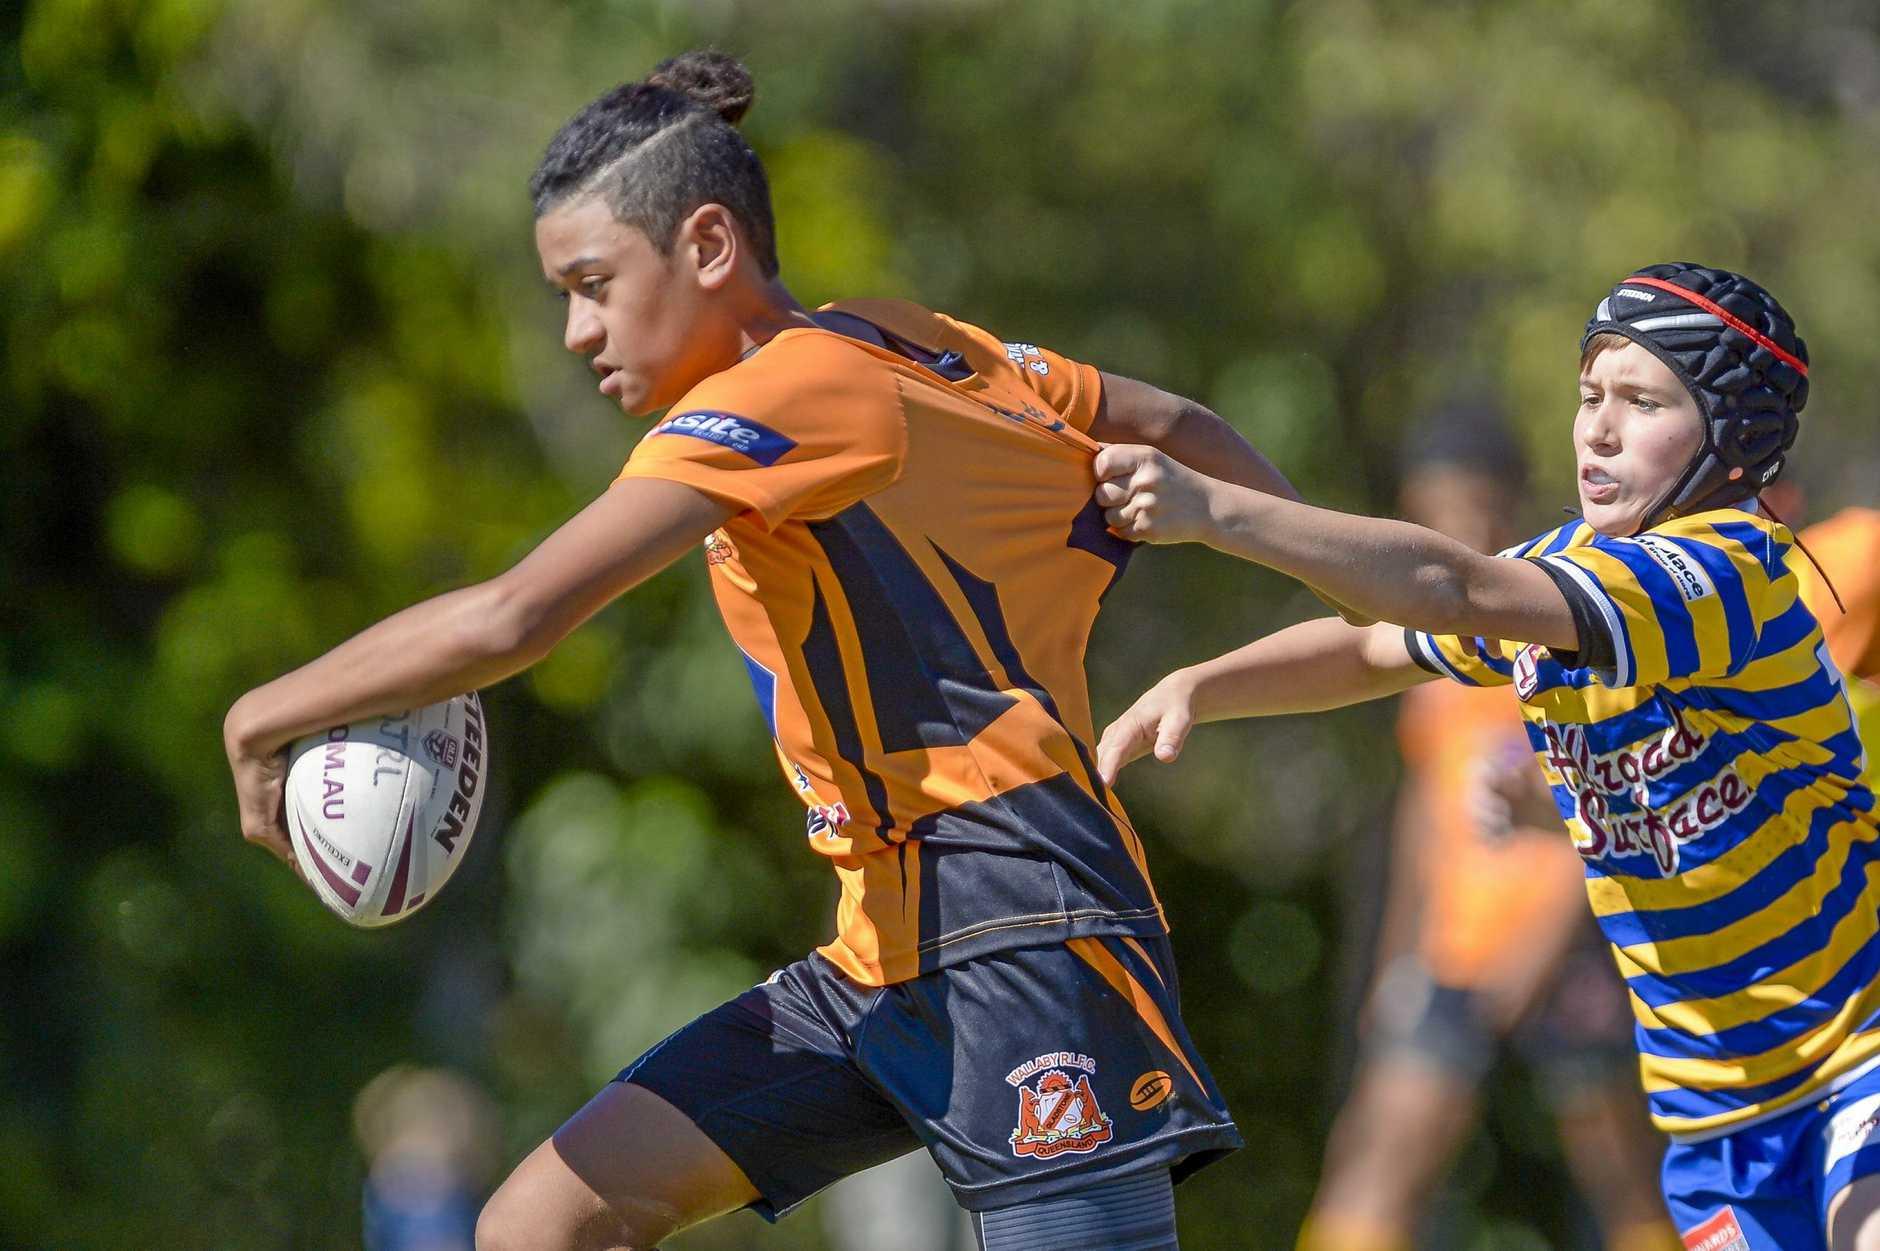 ONE STEP AHEAD: Gladstone Wallabys' Manasa Johnson-Saumalu shrugs off a tackle at the Jason Hetherington Cup.